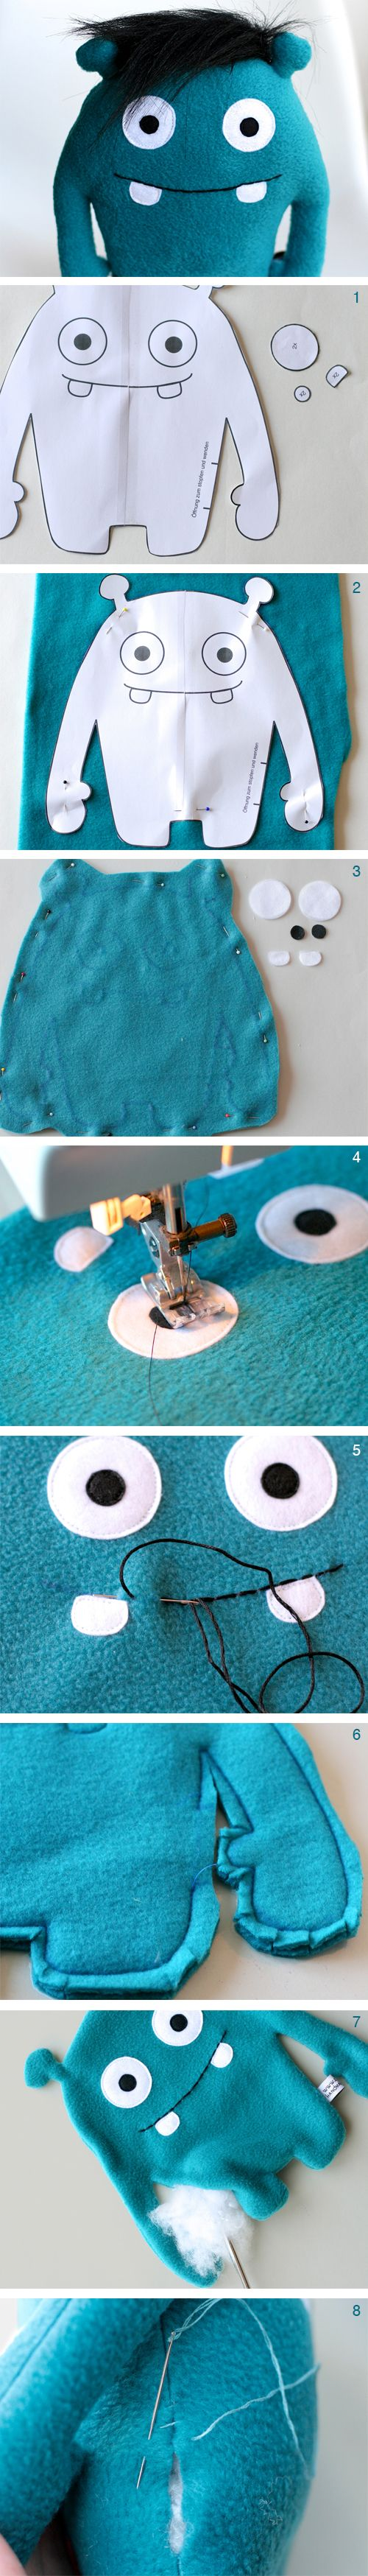 DIY Nähanleitung: Kleines Snuufie Monster nähen // diy sewing tutorial: how to sew a little plush toy monster via DaWanda.com